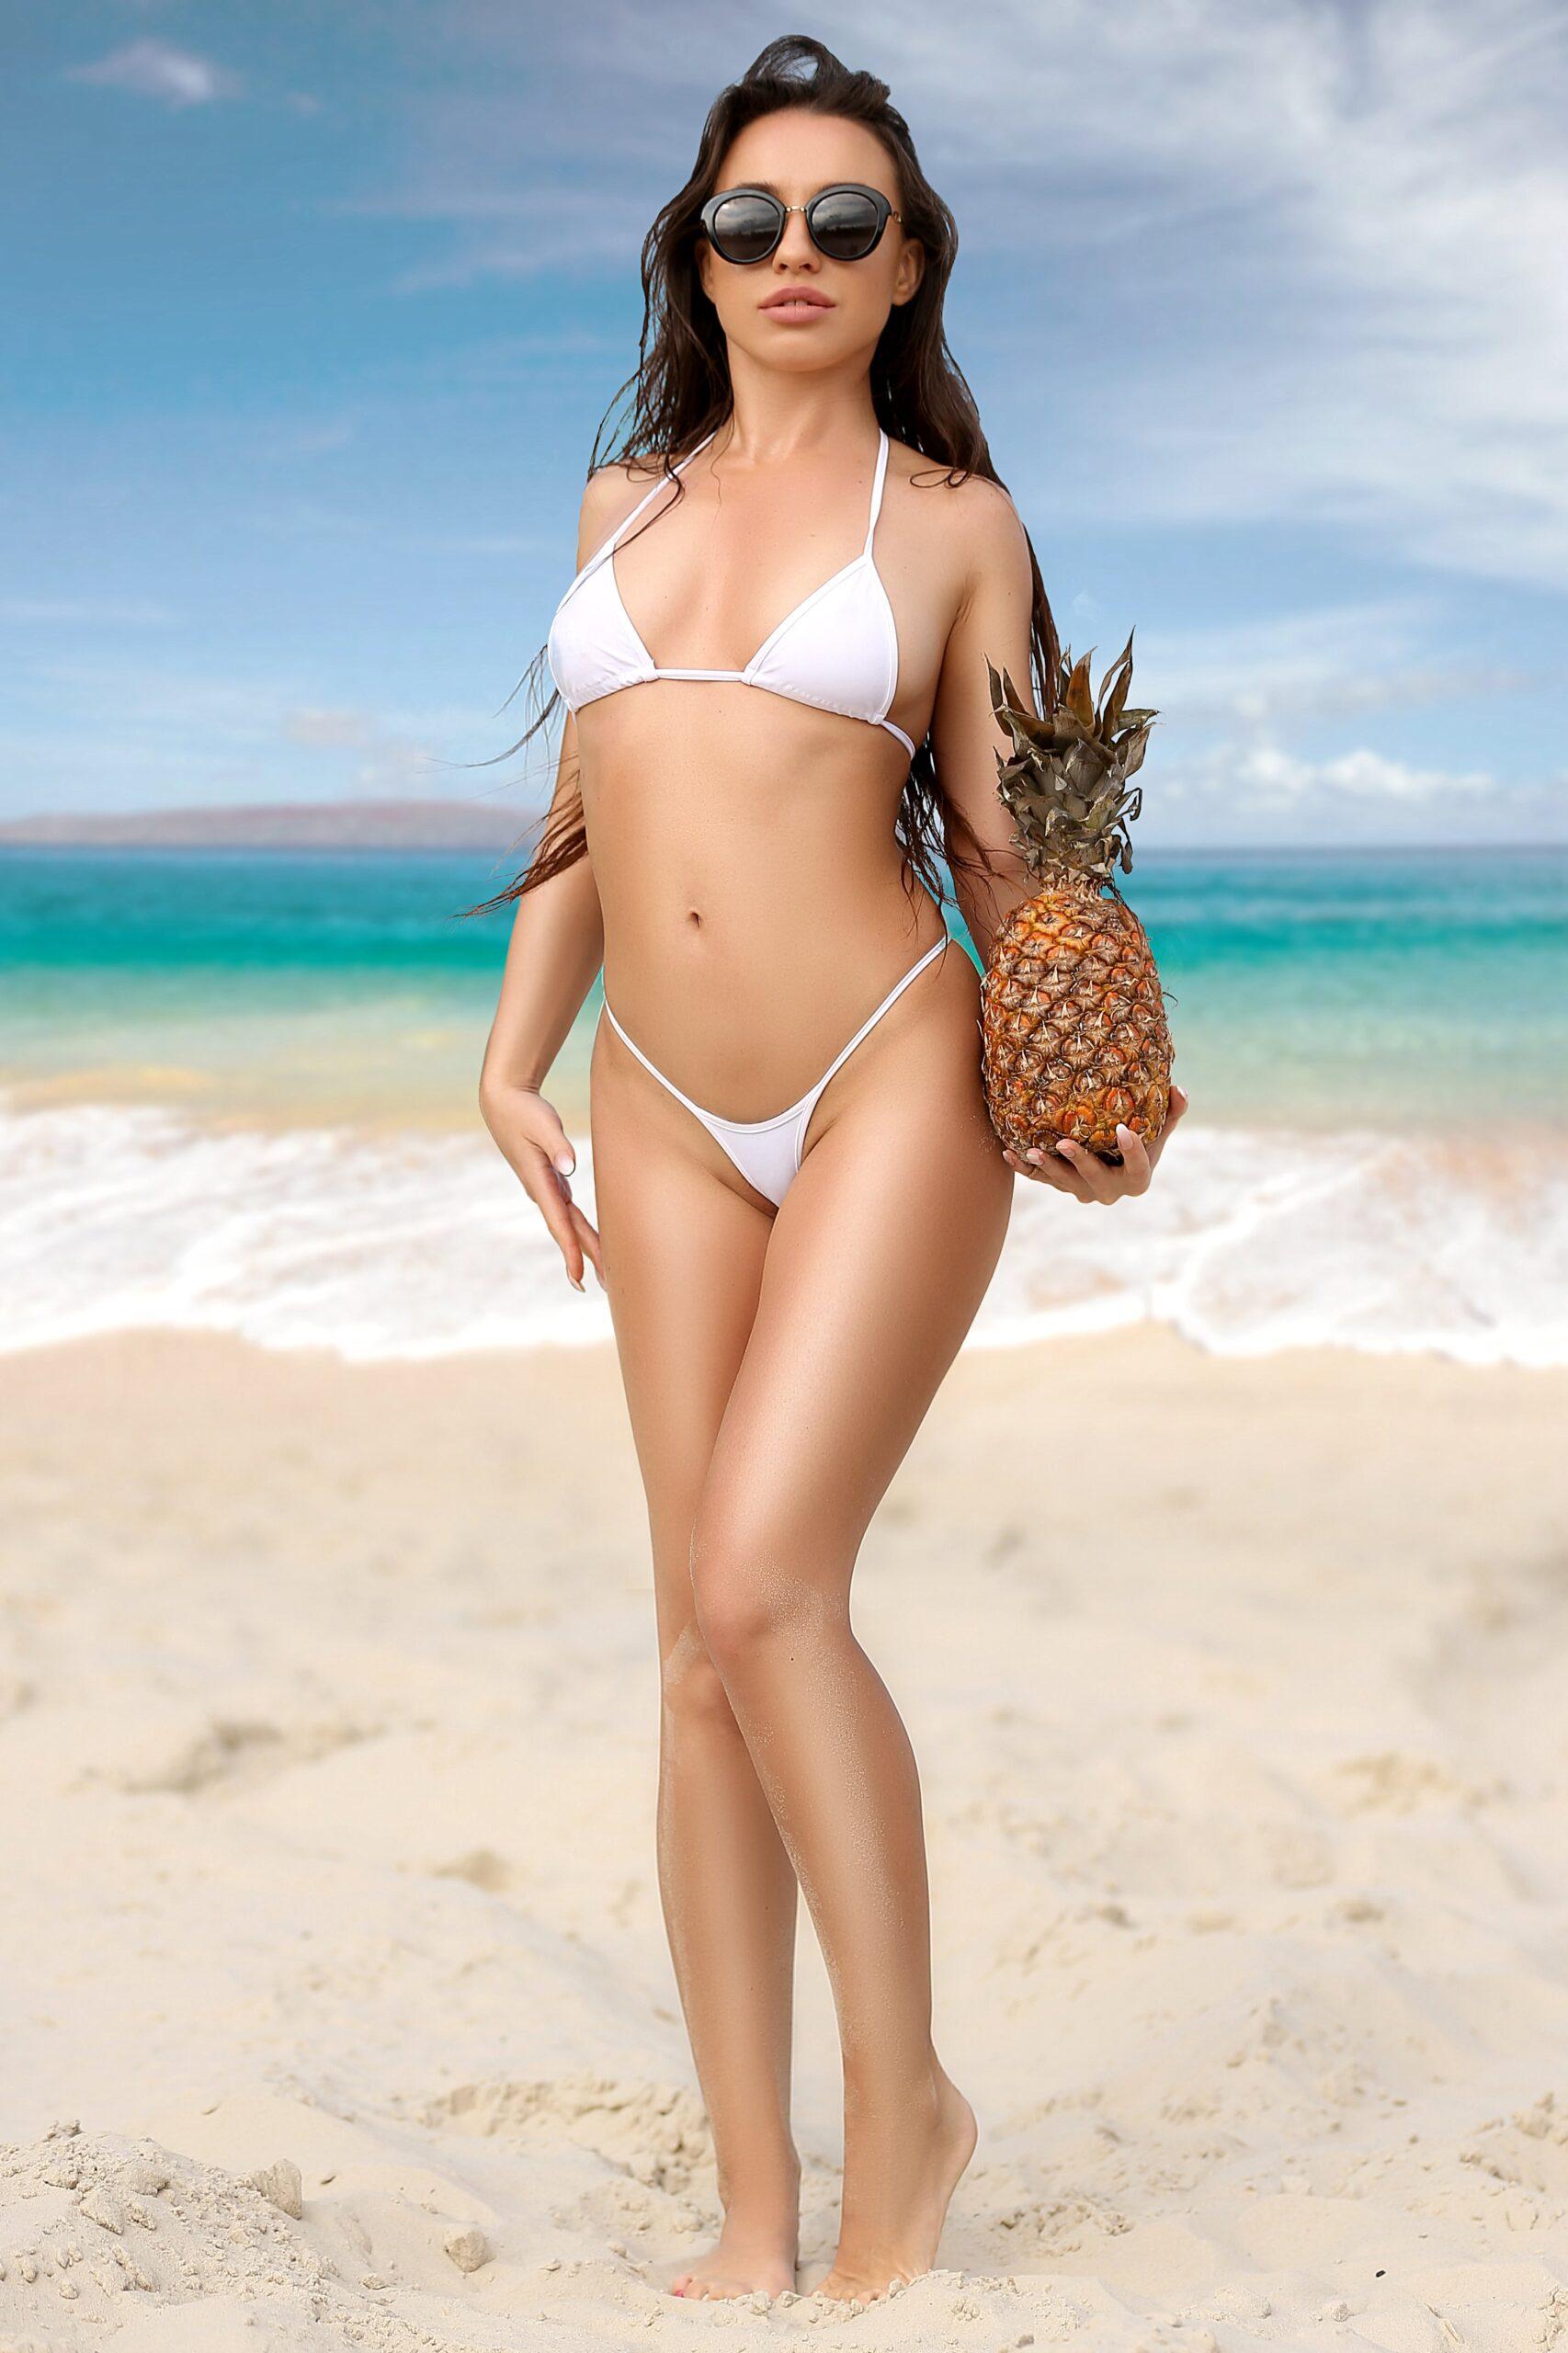 Sexy hot micro open thong crotchless panties. Erotic lingerie underwear. Extreme mini white bikini bottom + top. Cheeky two piece swimwear.